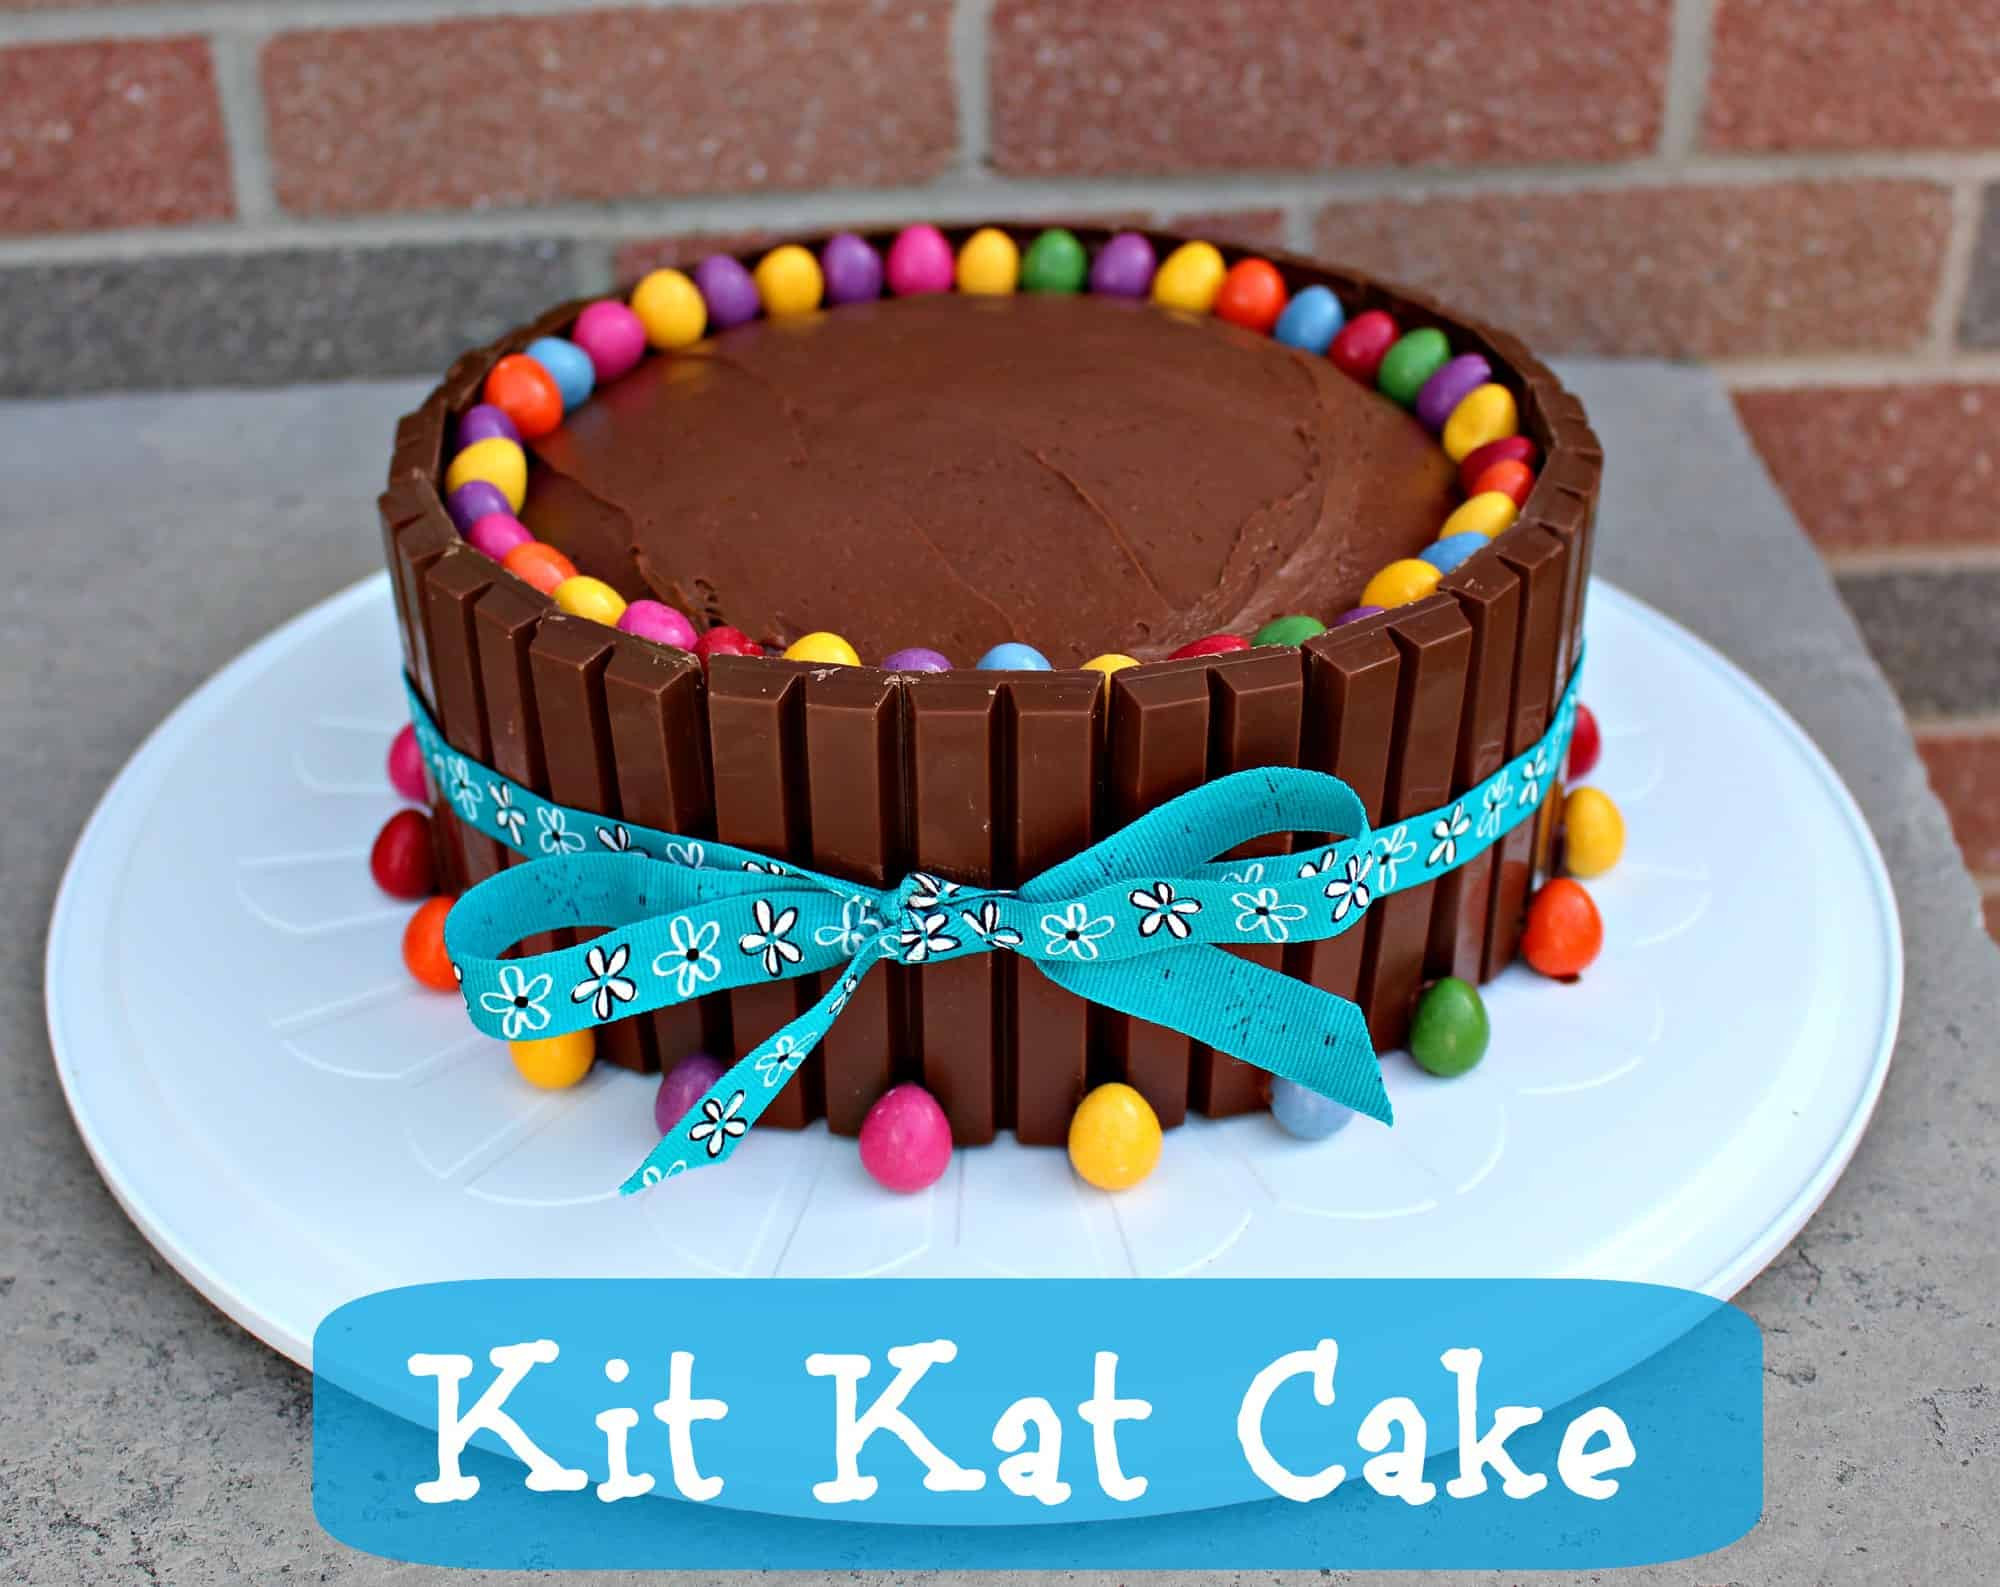 Easy Birthday Cake Ideas  Easy Birthday Cake Ideas – Kit Kat Cake Recipe Little